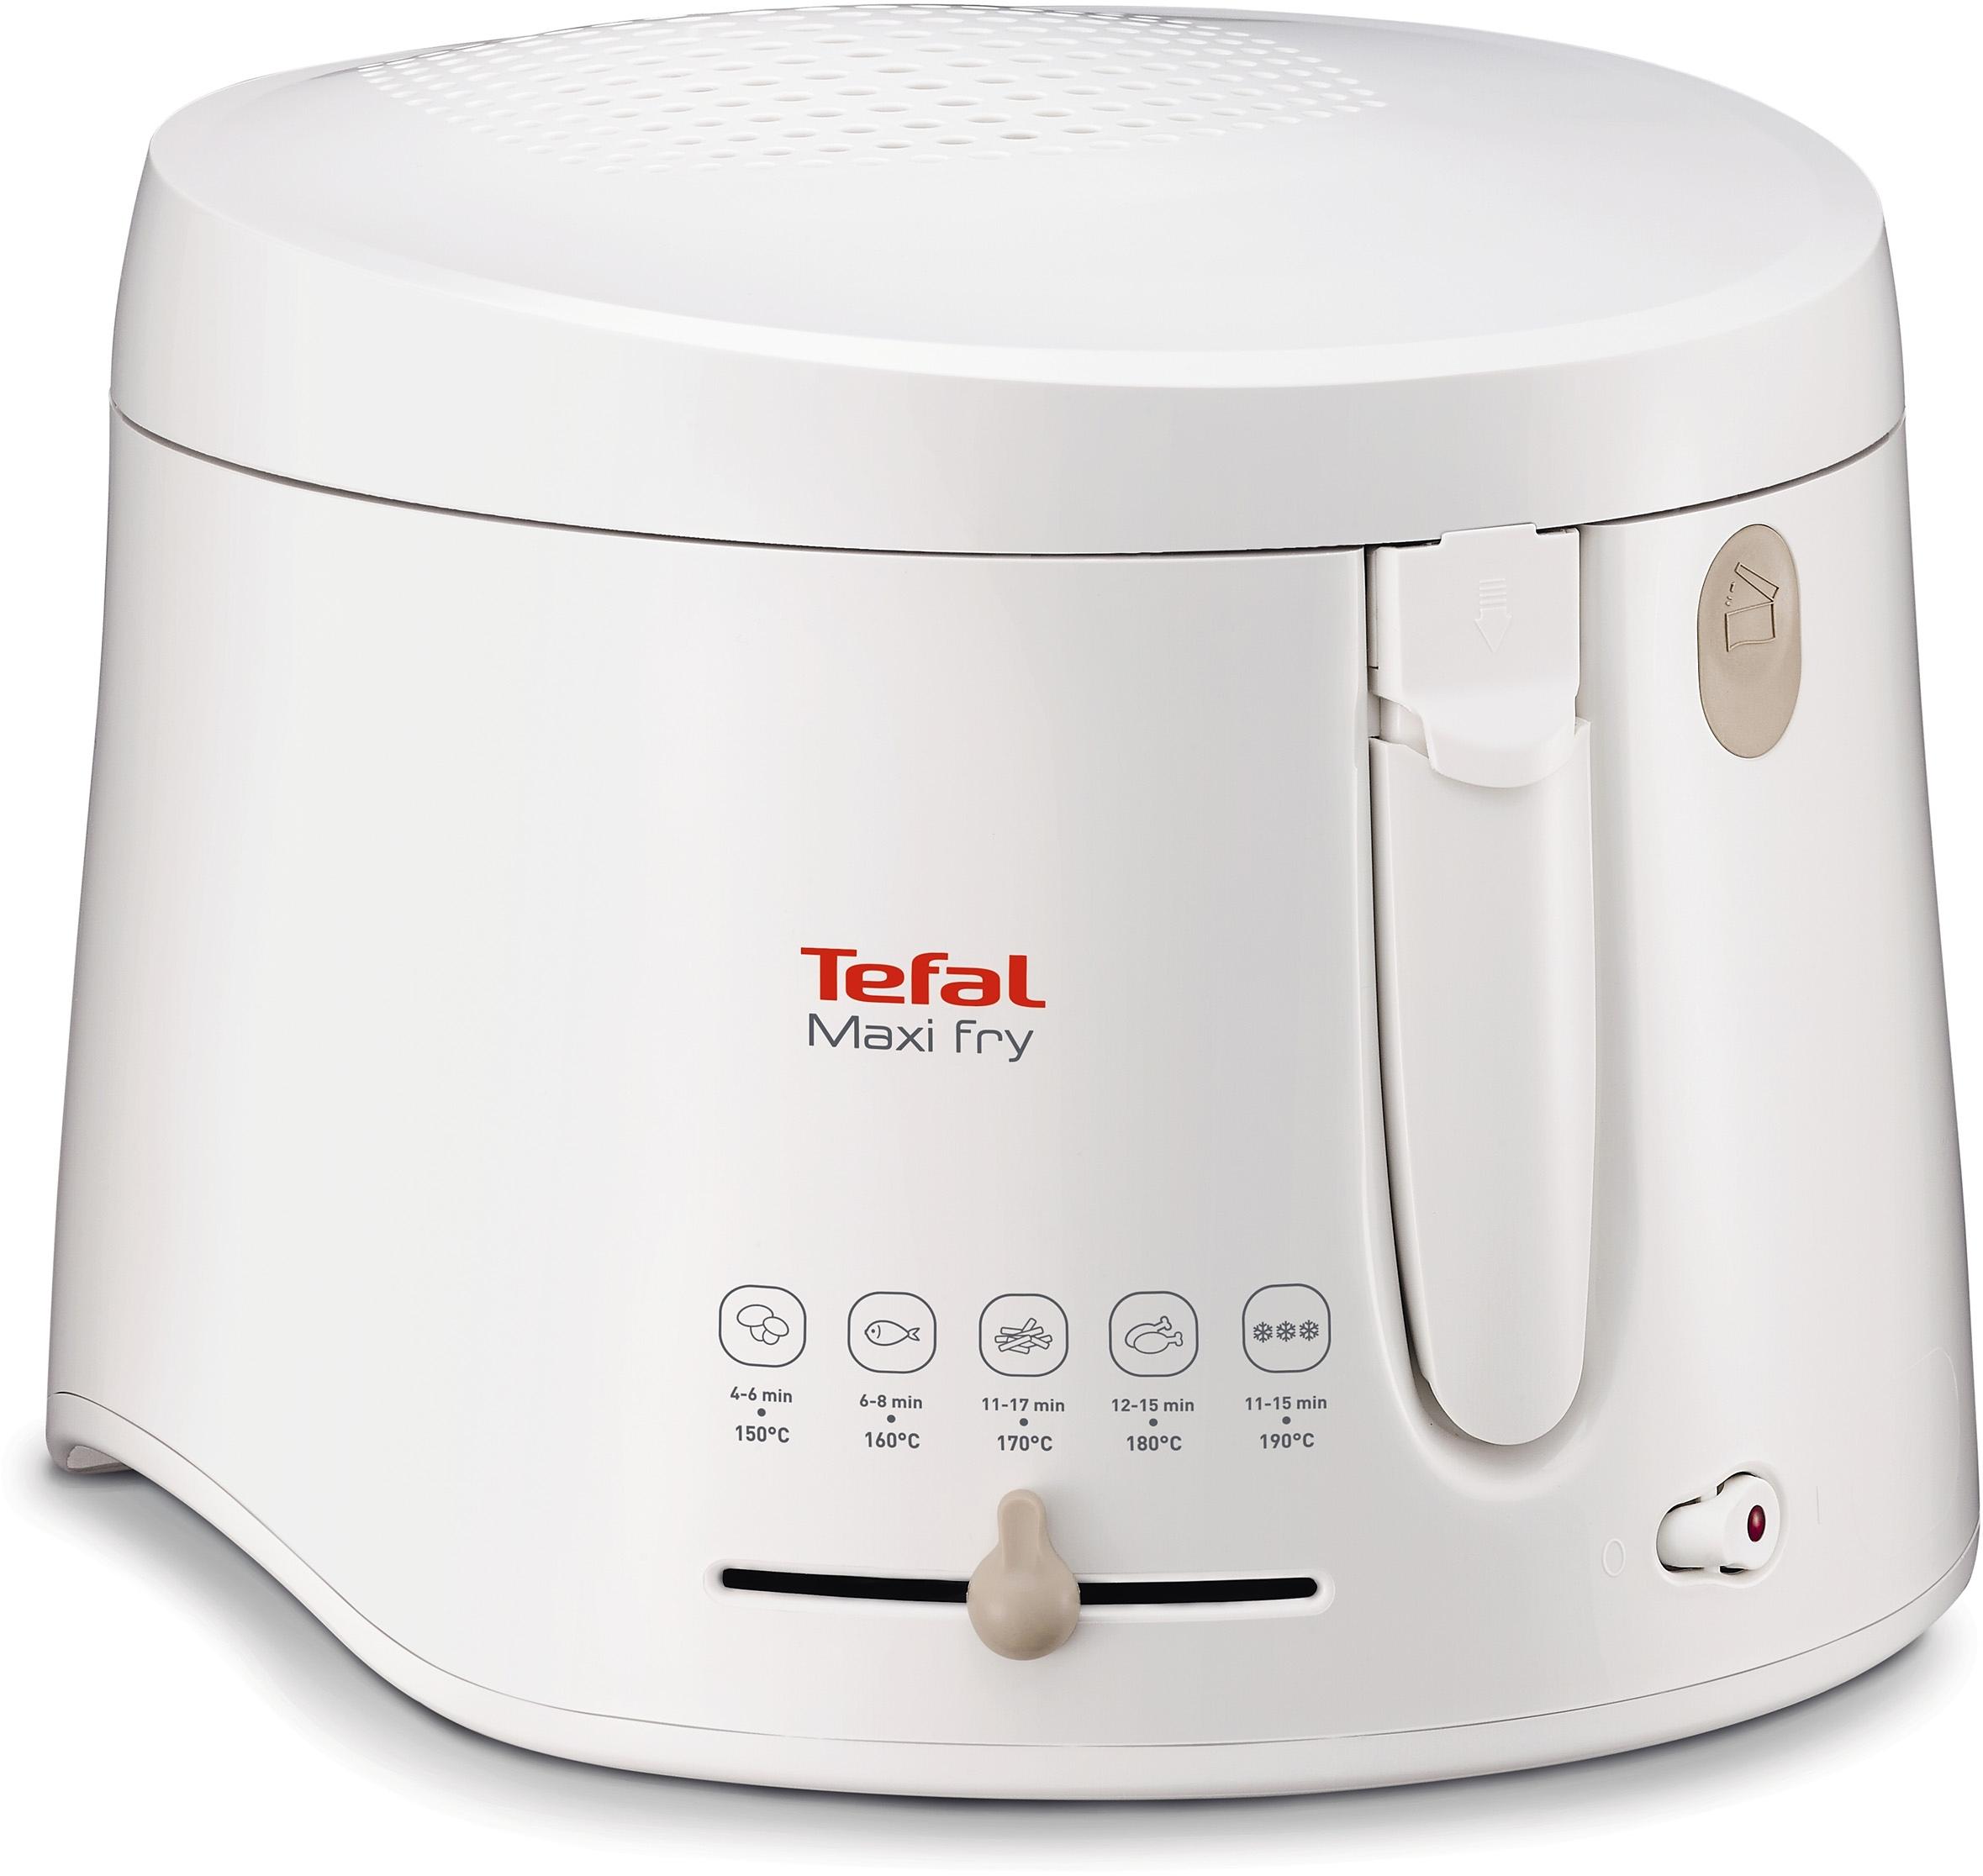 Tefal friteuse Maxifry FF1000 Inhoud voor 1,2 kg, afneembare, vaatwasserbestendige deksel voordelig en veilig online kopen